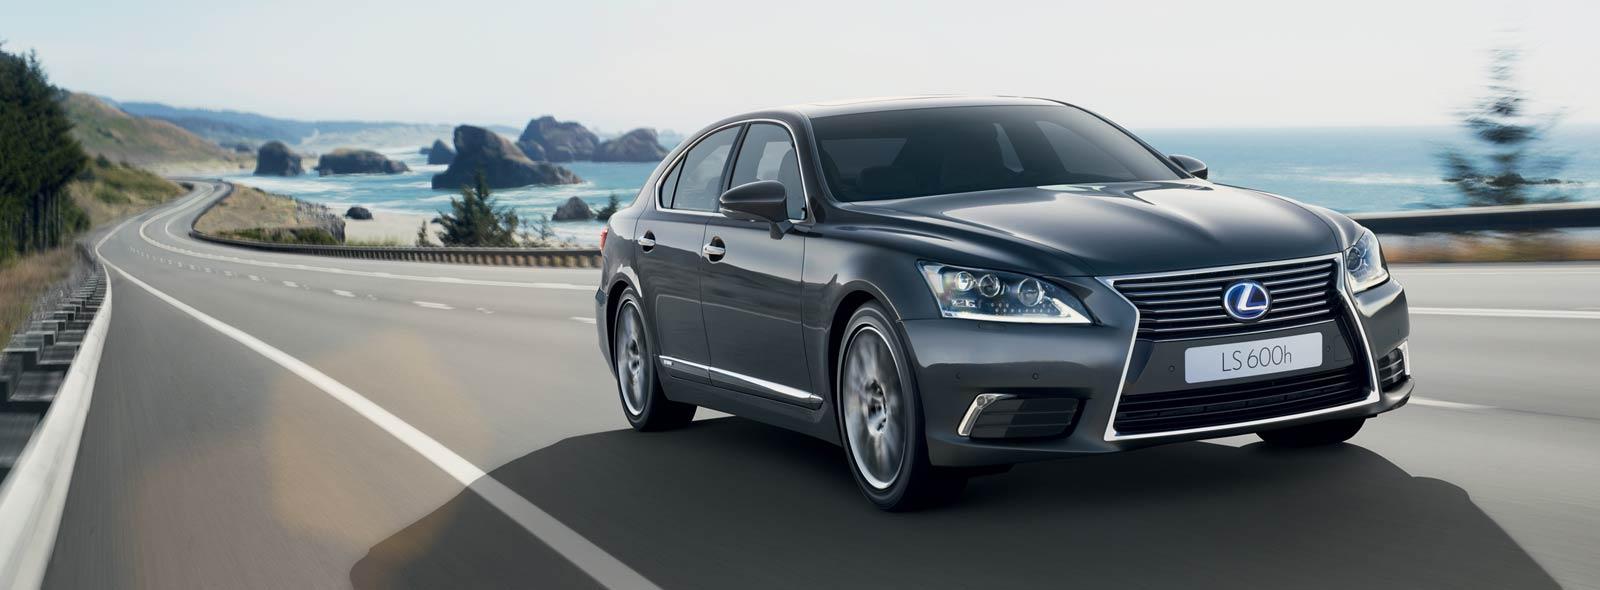 Lexus LS Hybrid colore grigio scuro mentre percorre una strada costiera